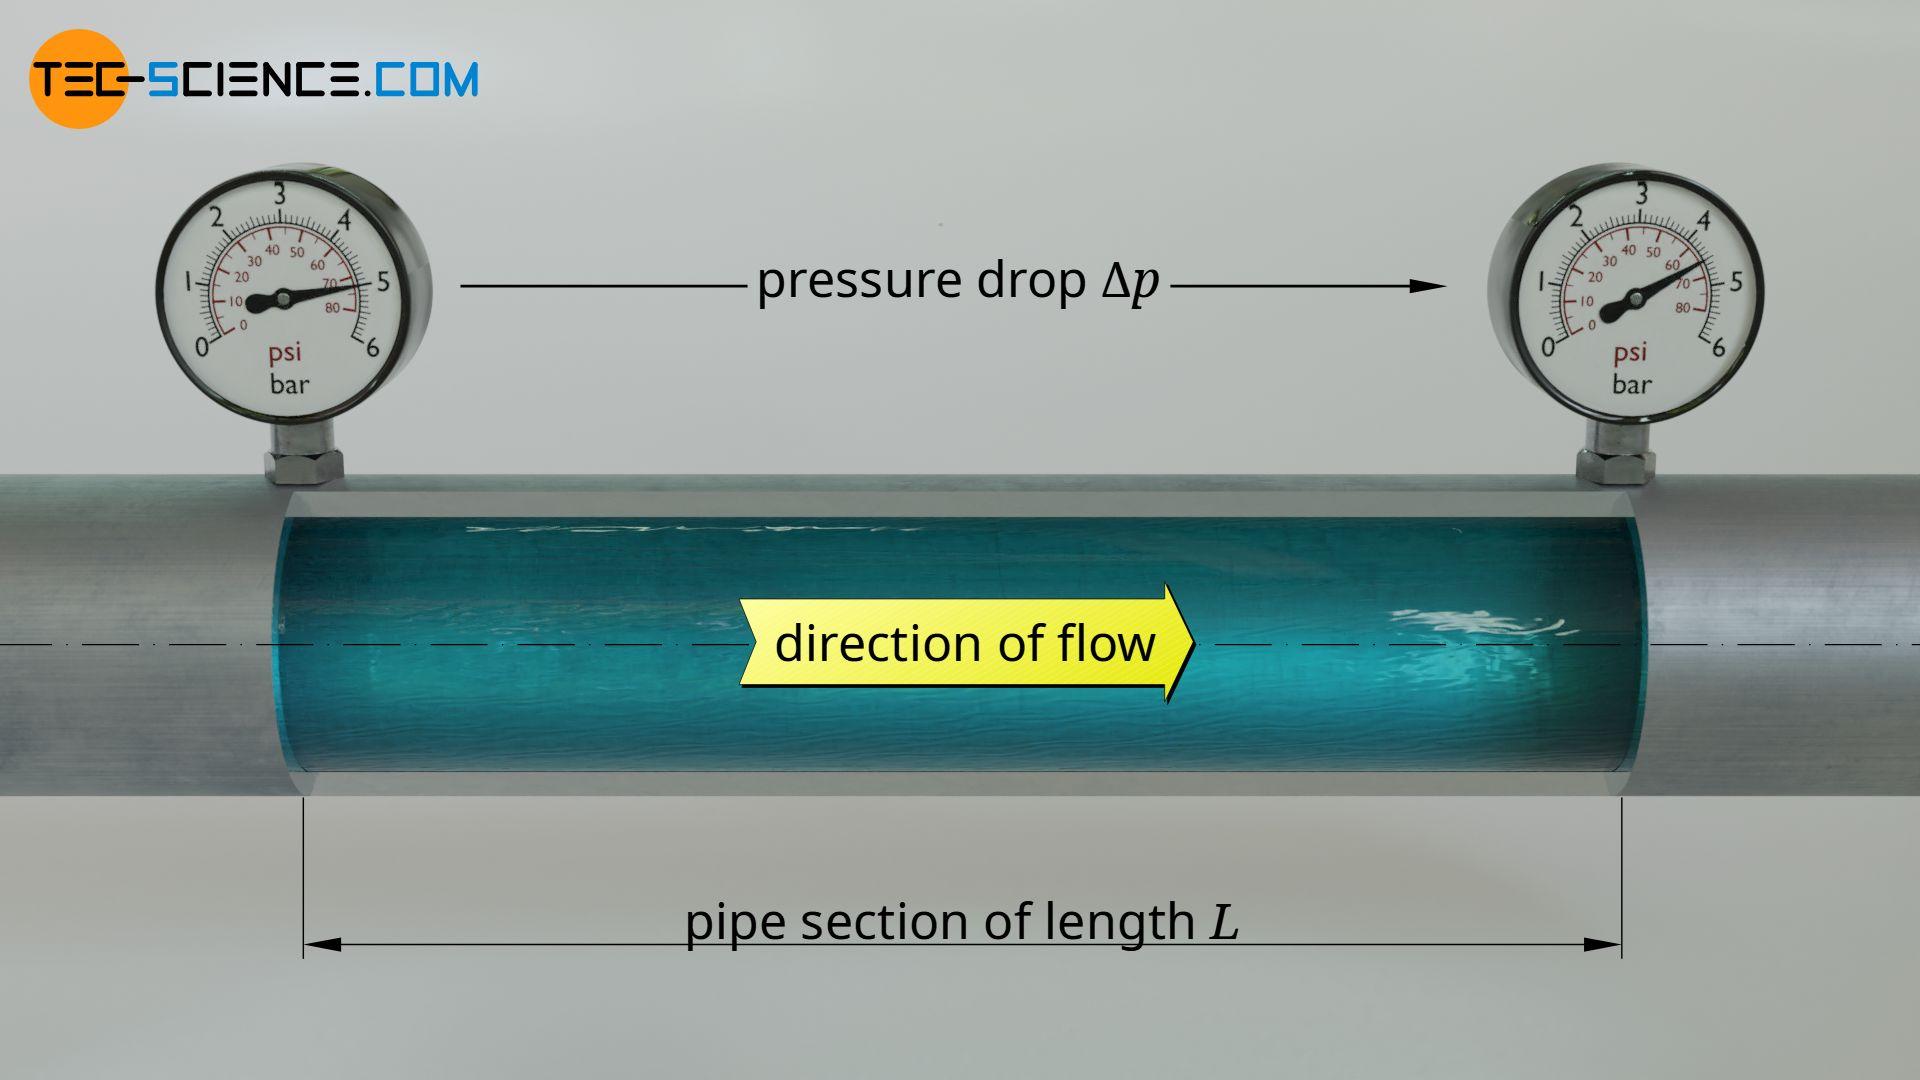 Pressure loss (pressure drop) in a pipeline